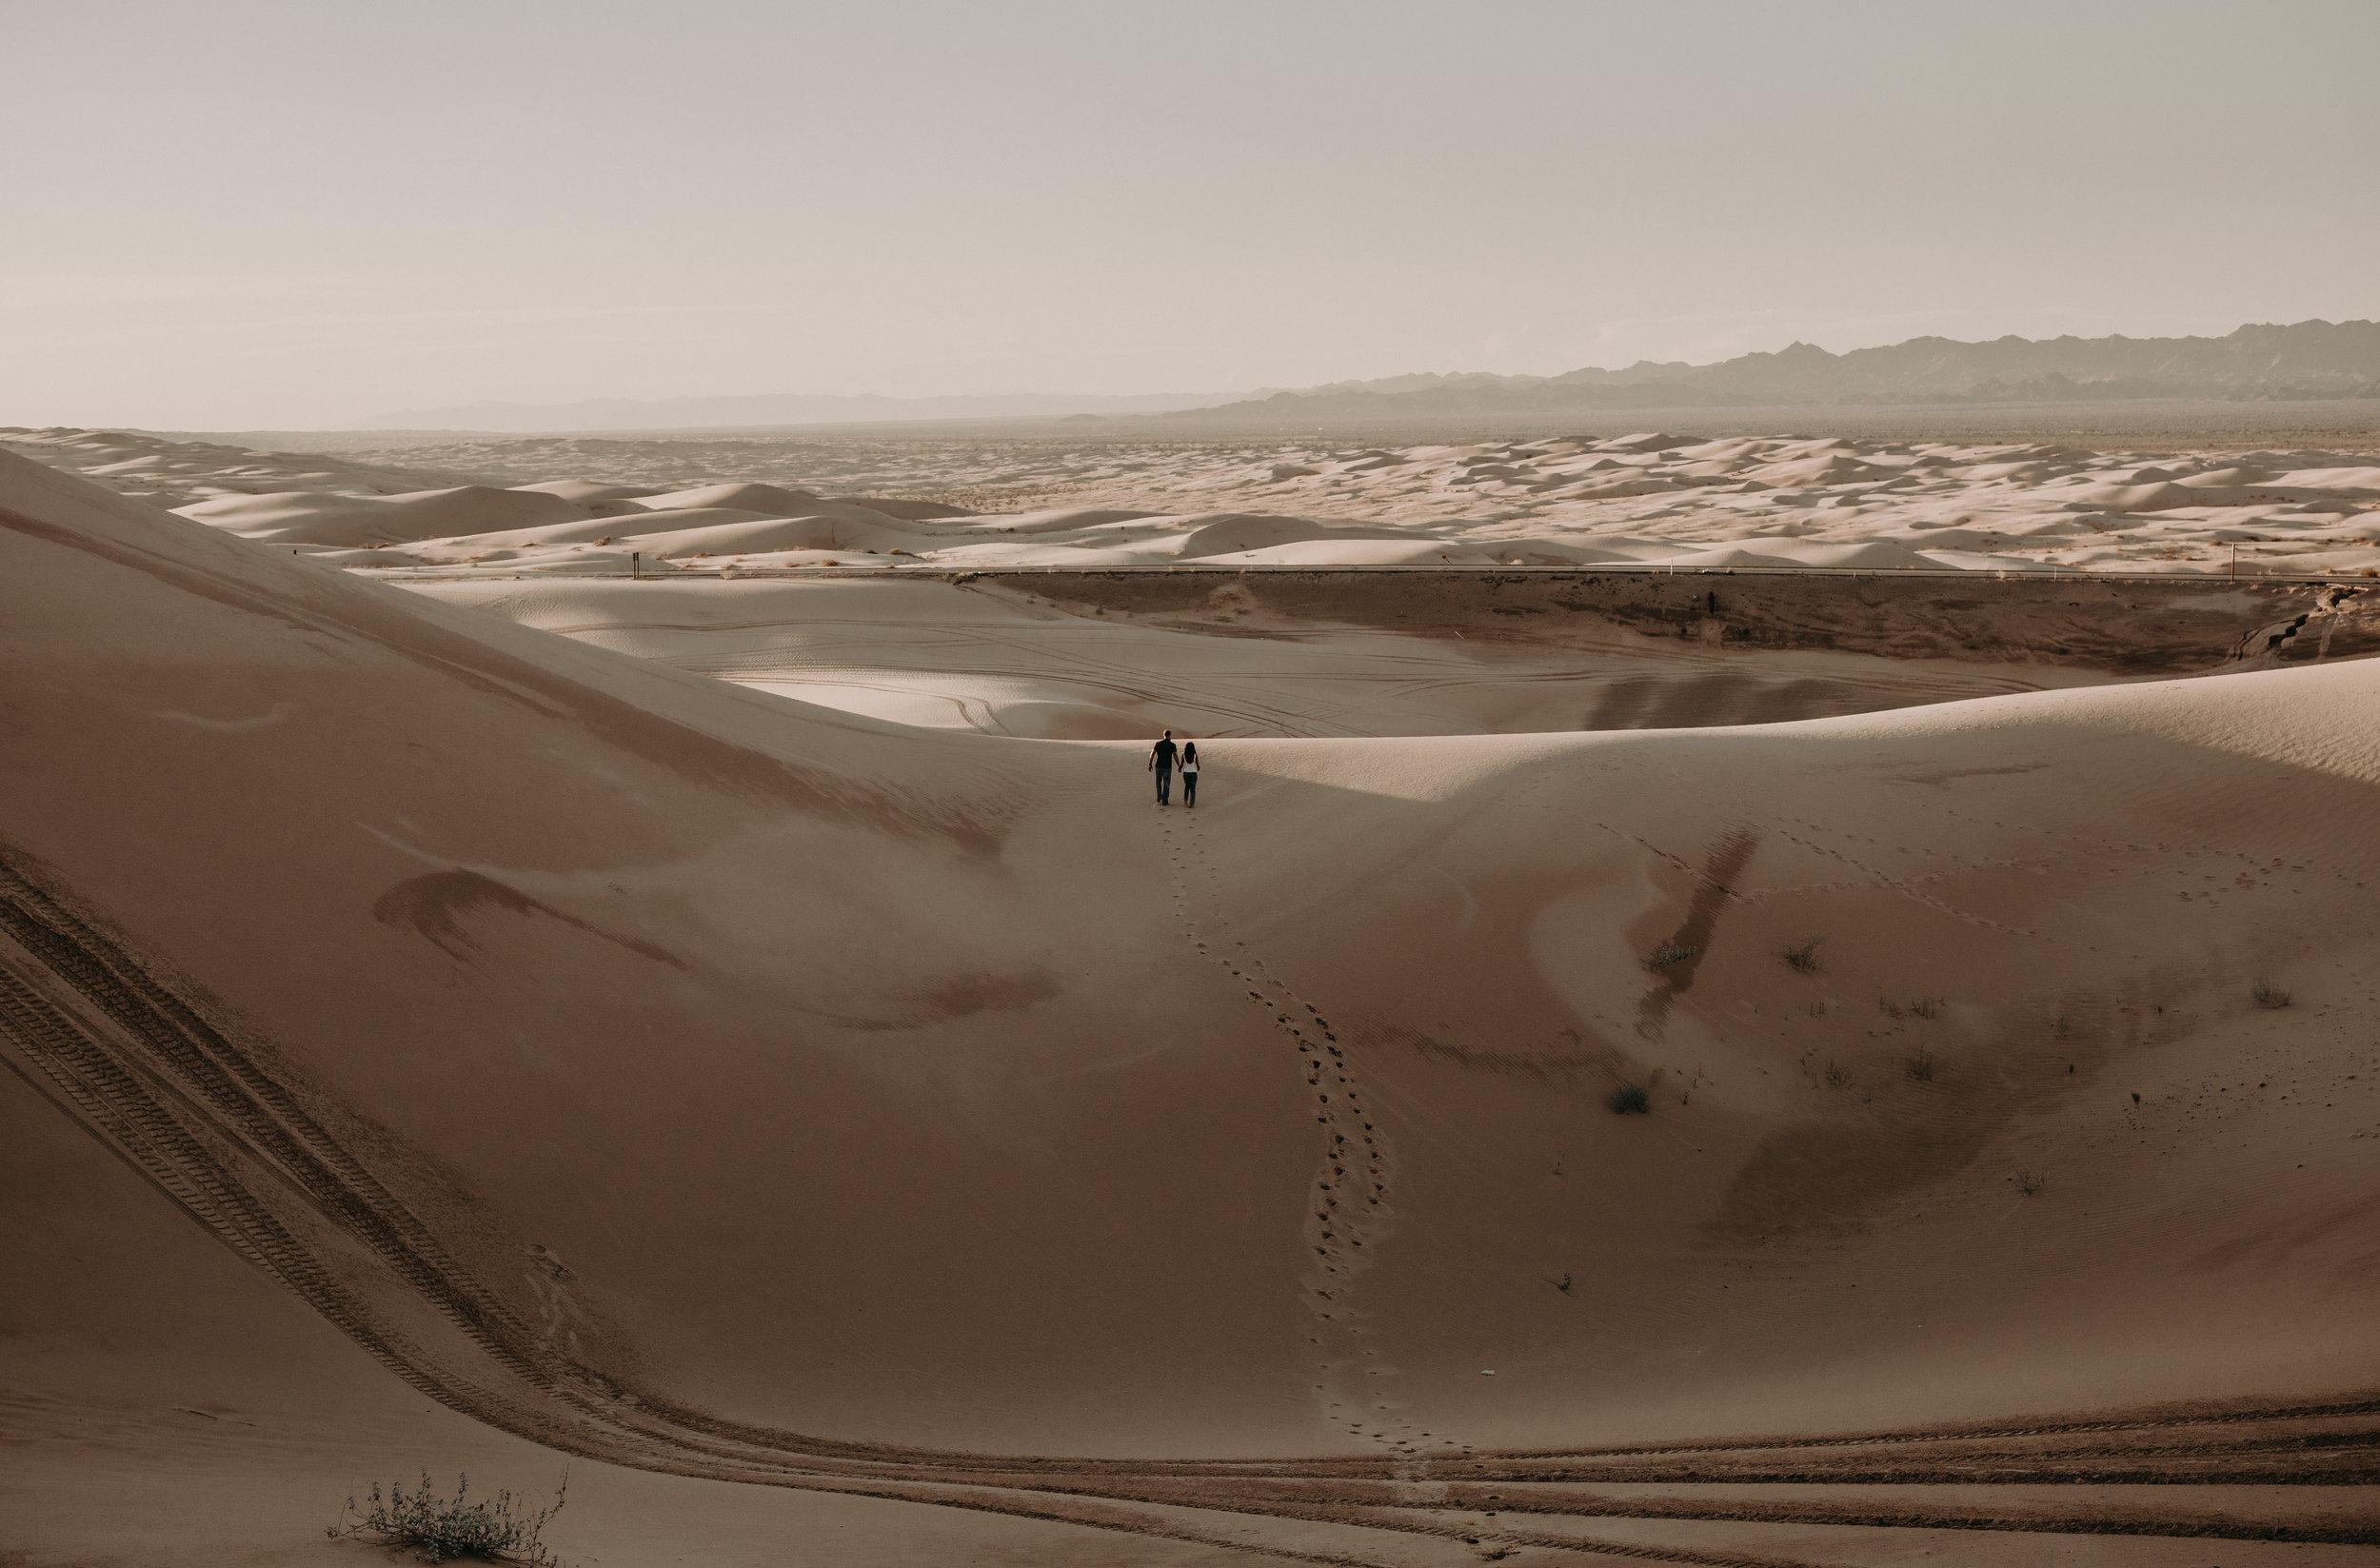 sand_dune_engagement_photos.jpg